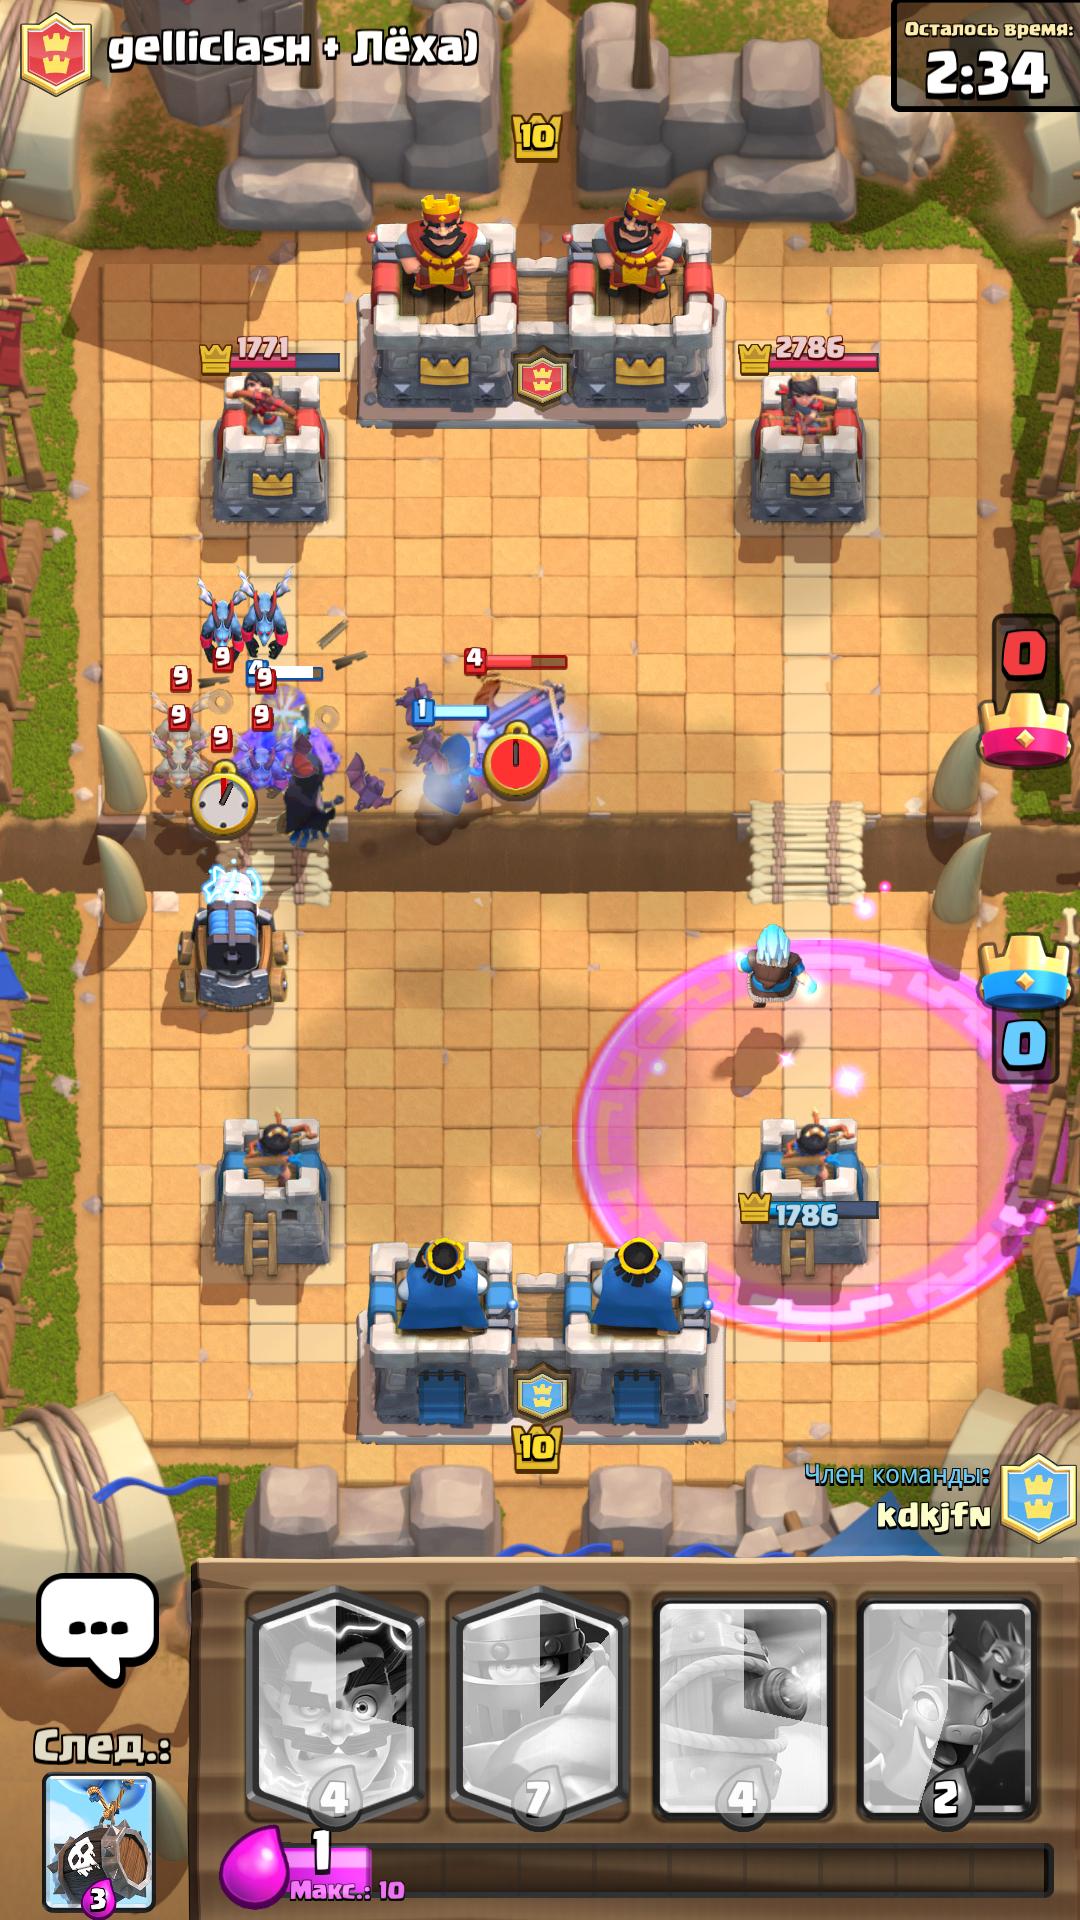 Null's Royale - 2 vs 2